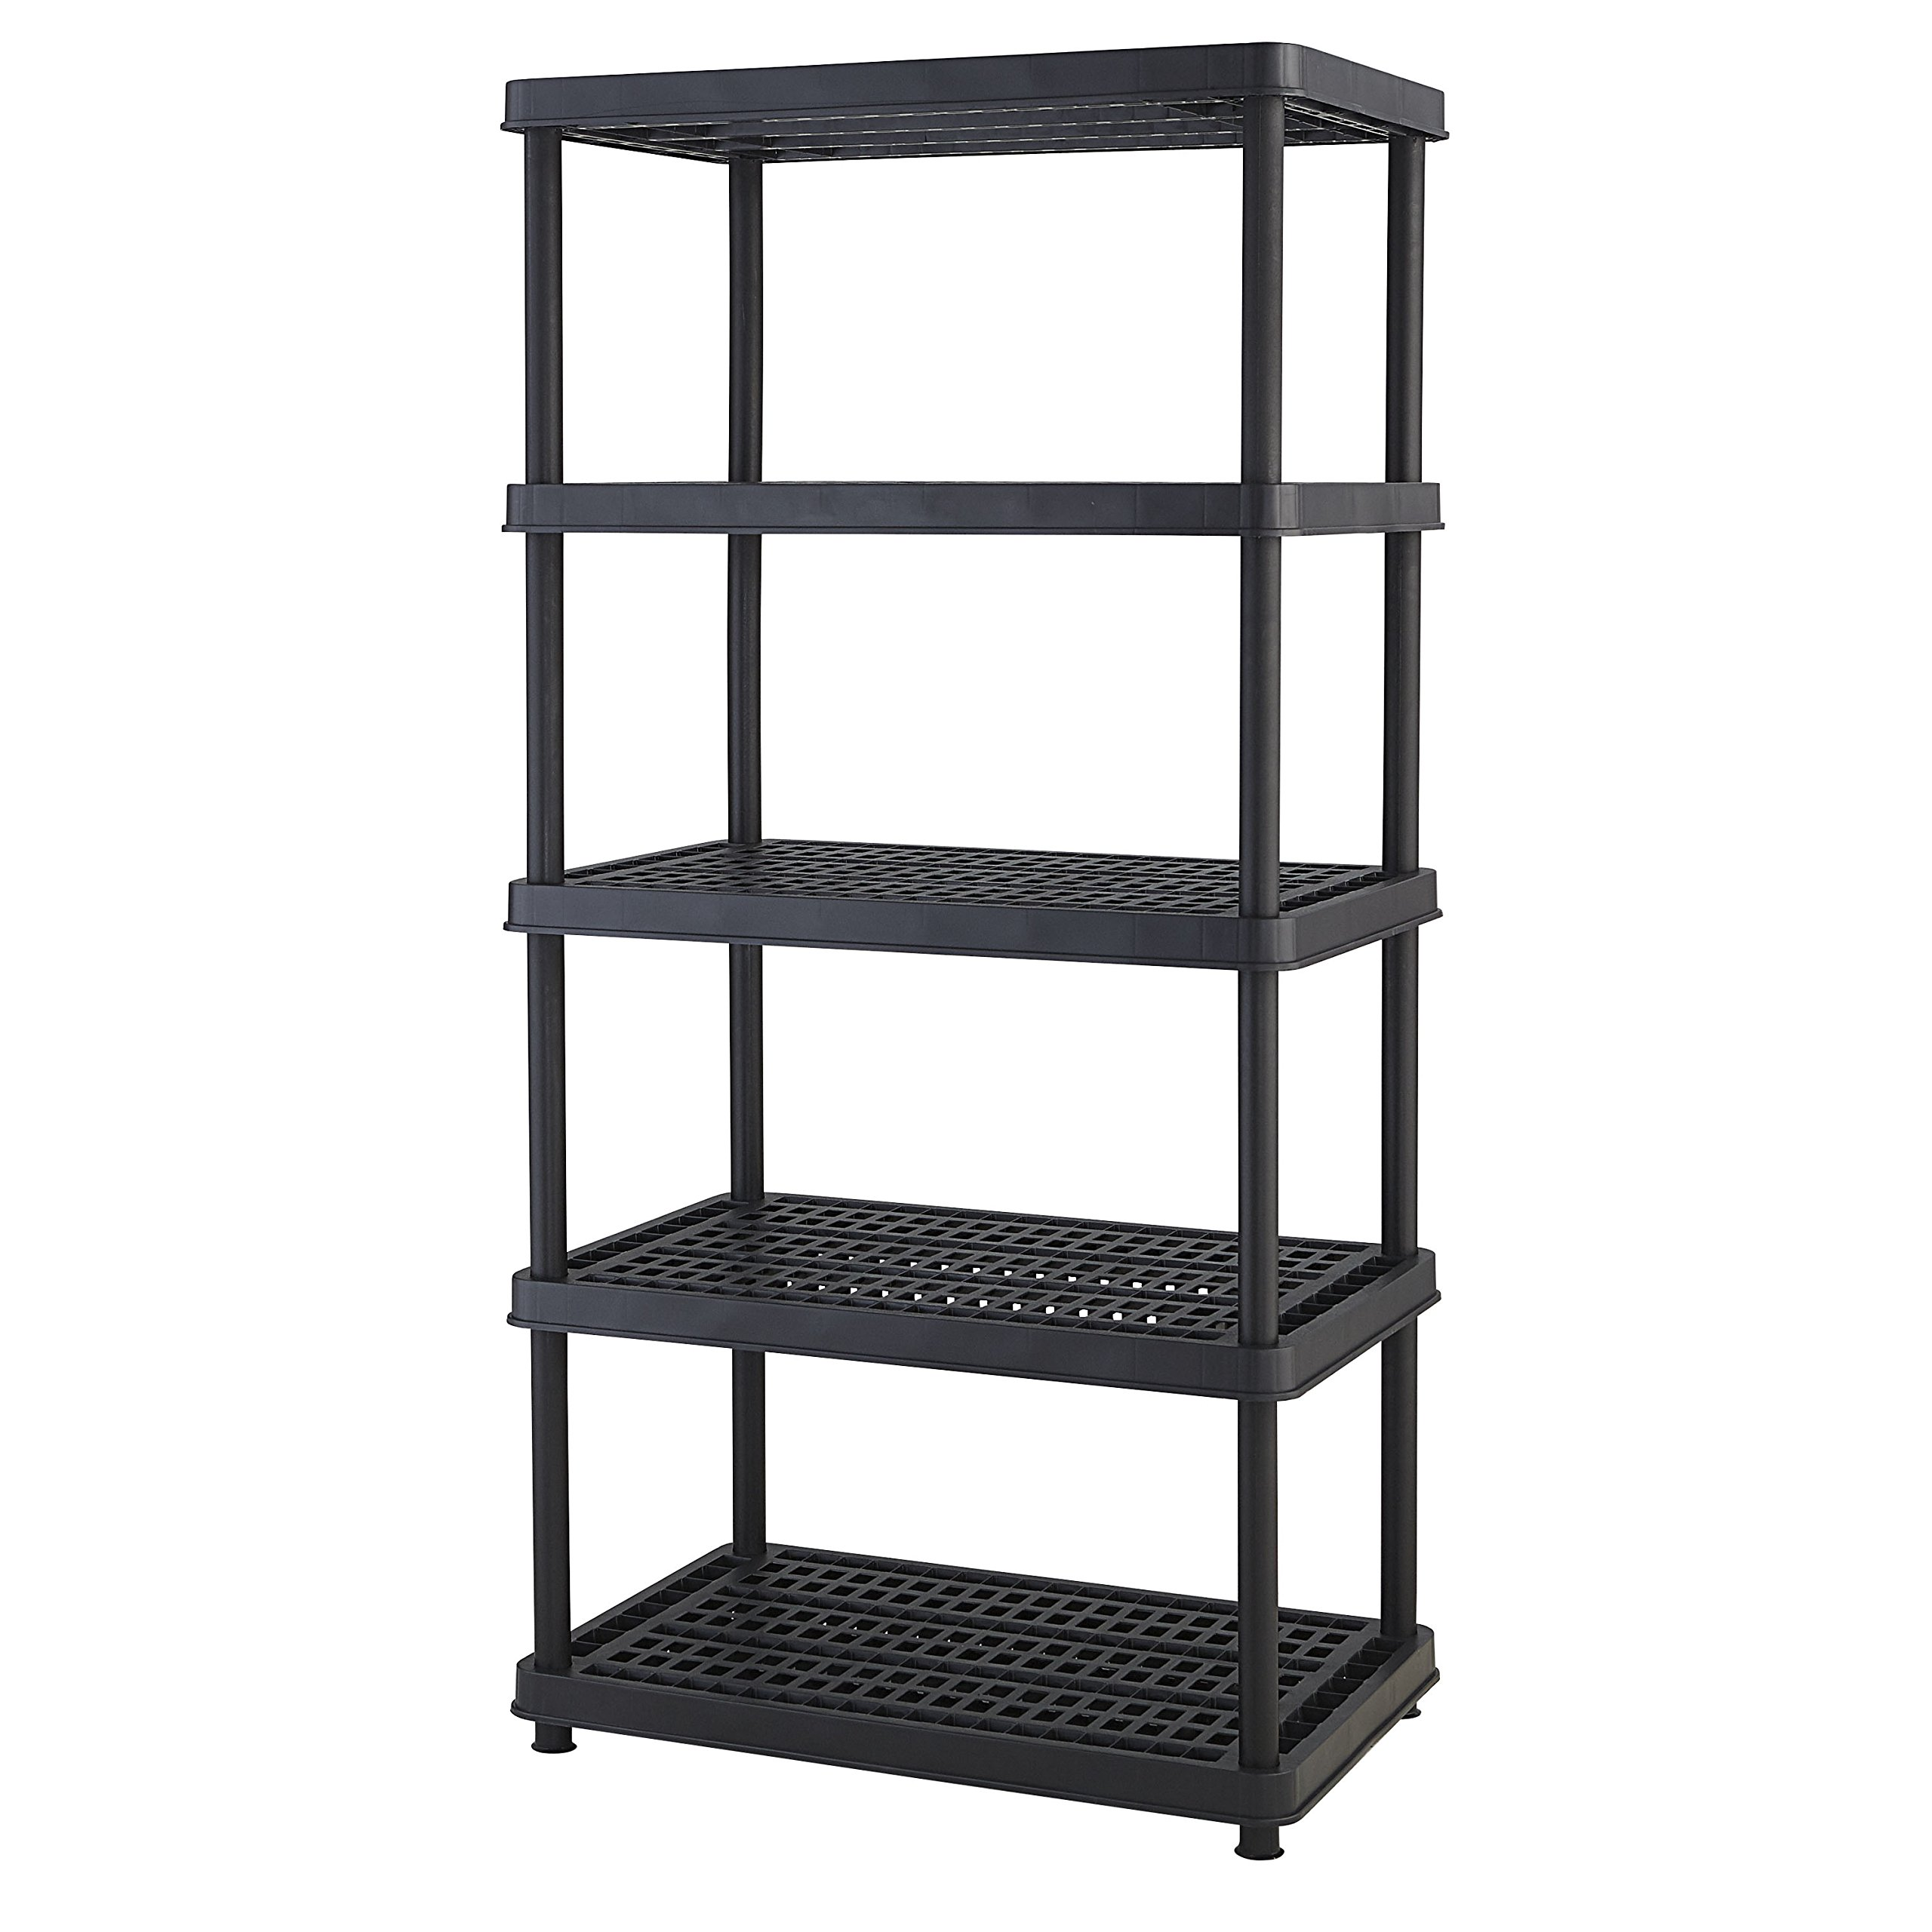 Keter 5-Shelf Heavy Duty Utility Freestanding Ventilated Shelving Unit Storage Rack, Black by Keter